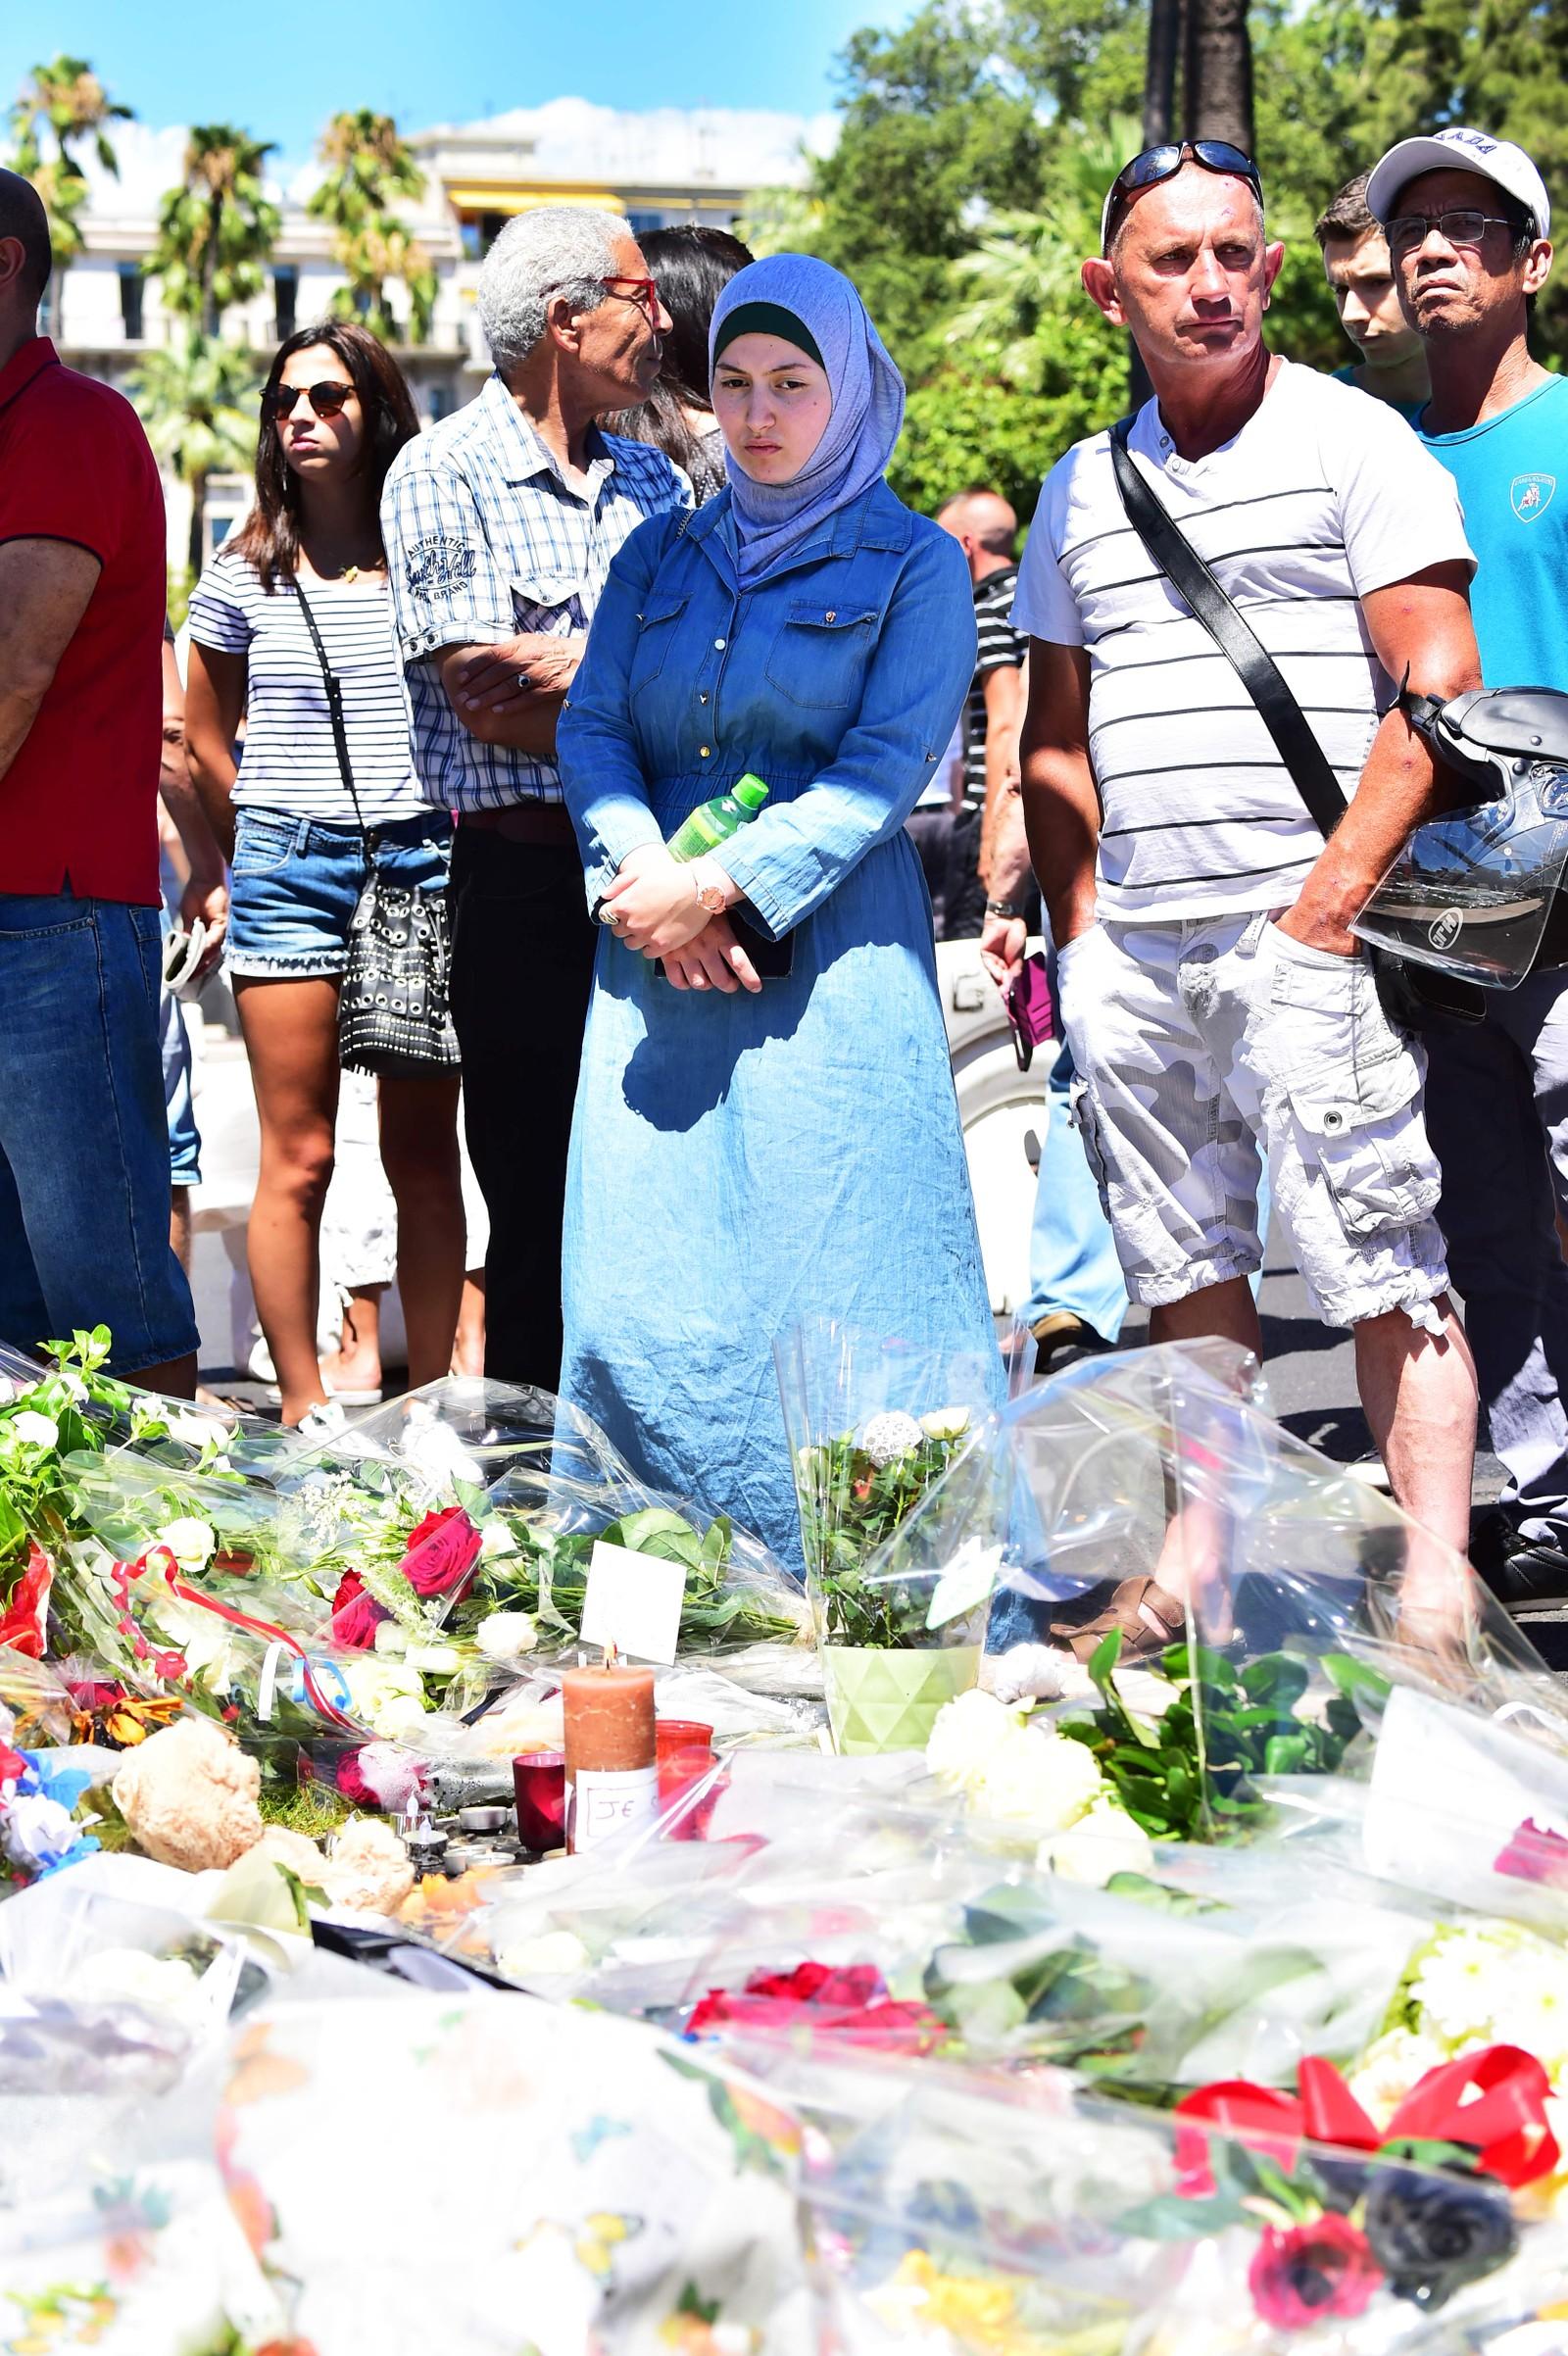 Sørgende og blomster i Nice ser på blomster til minne om ofrene for terrorangrepet i Nice 14. juli